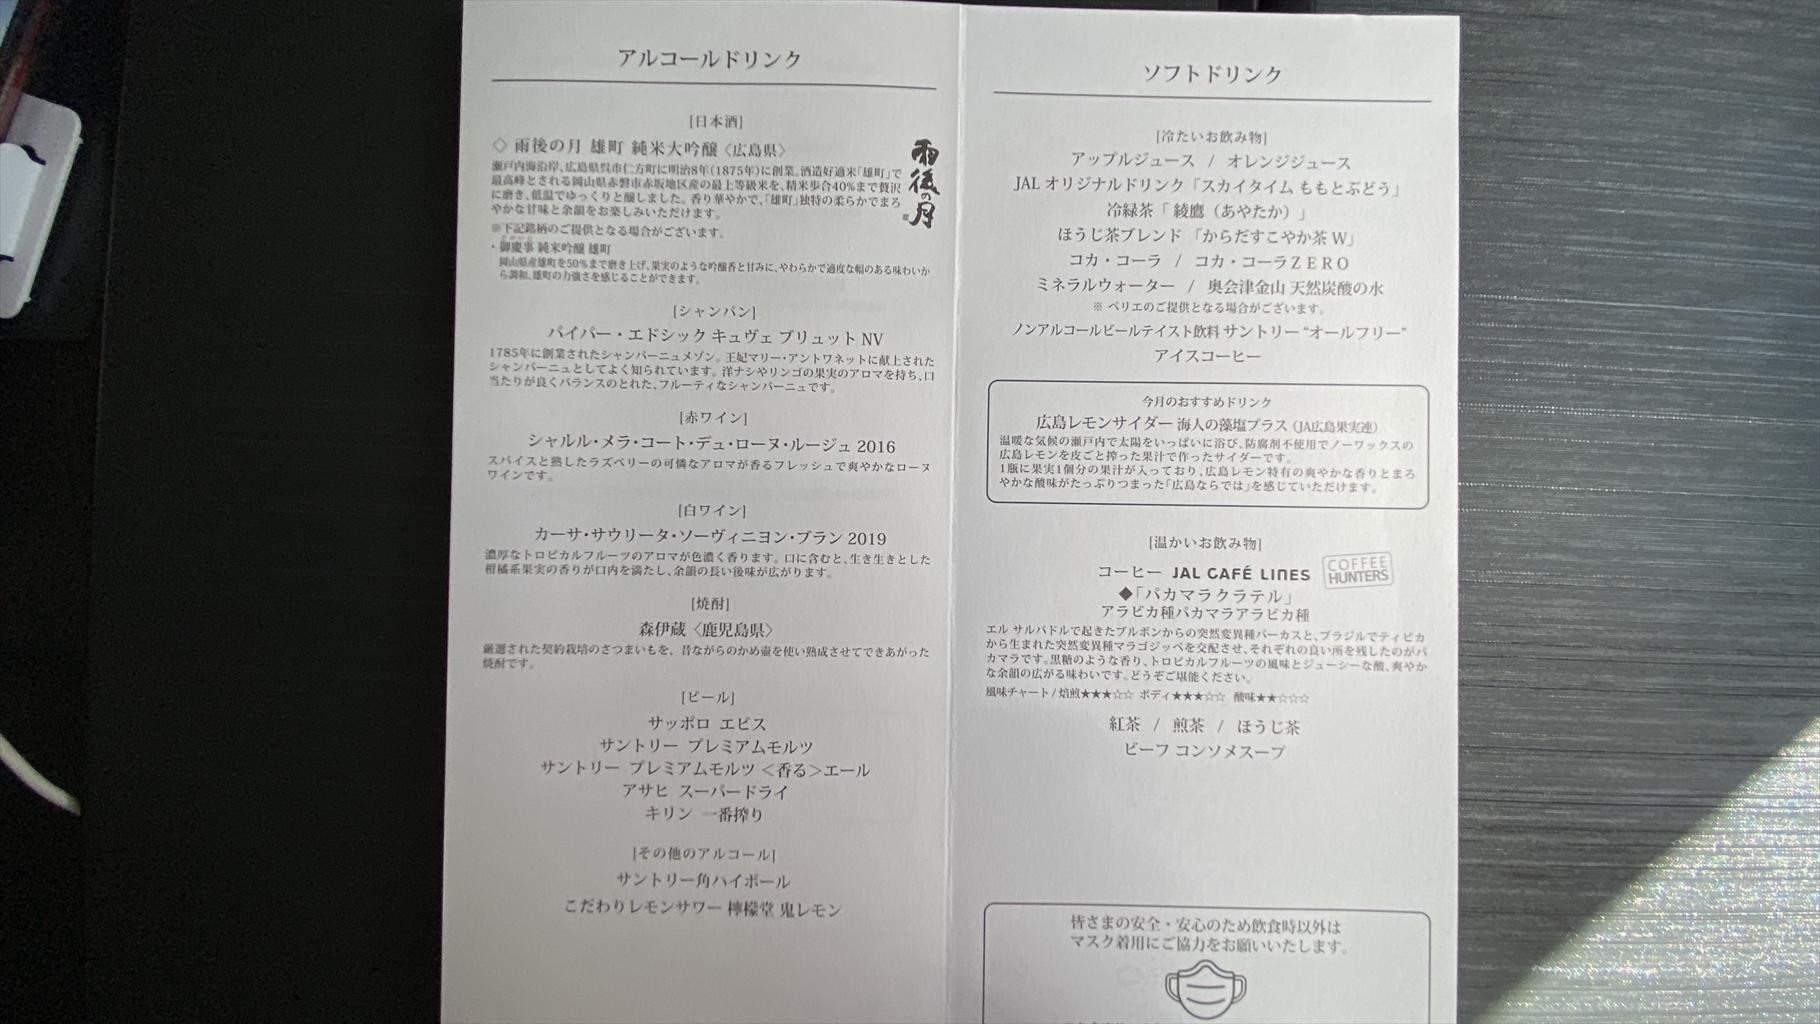 JAL JL904 沖縄(那覇)~羽田 ファーストクラス機内食 02JUN21